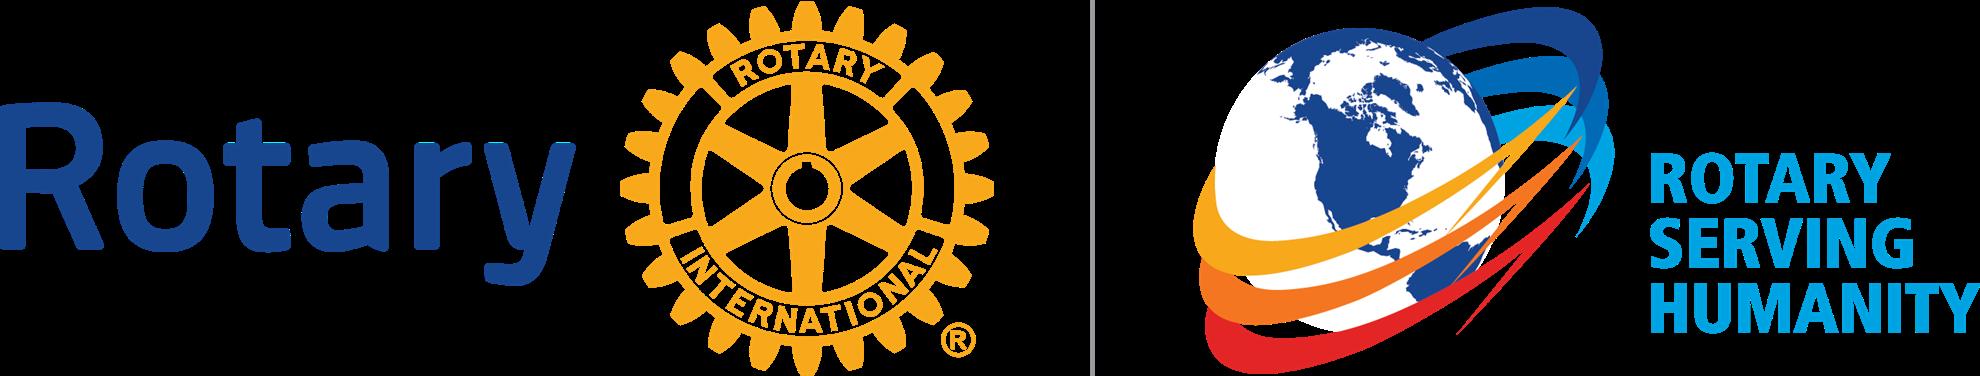 Rotaryclub Nuenen